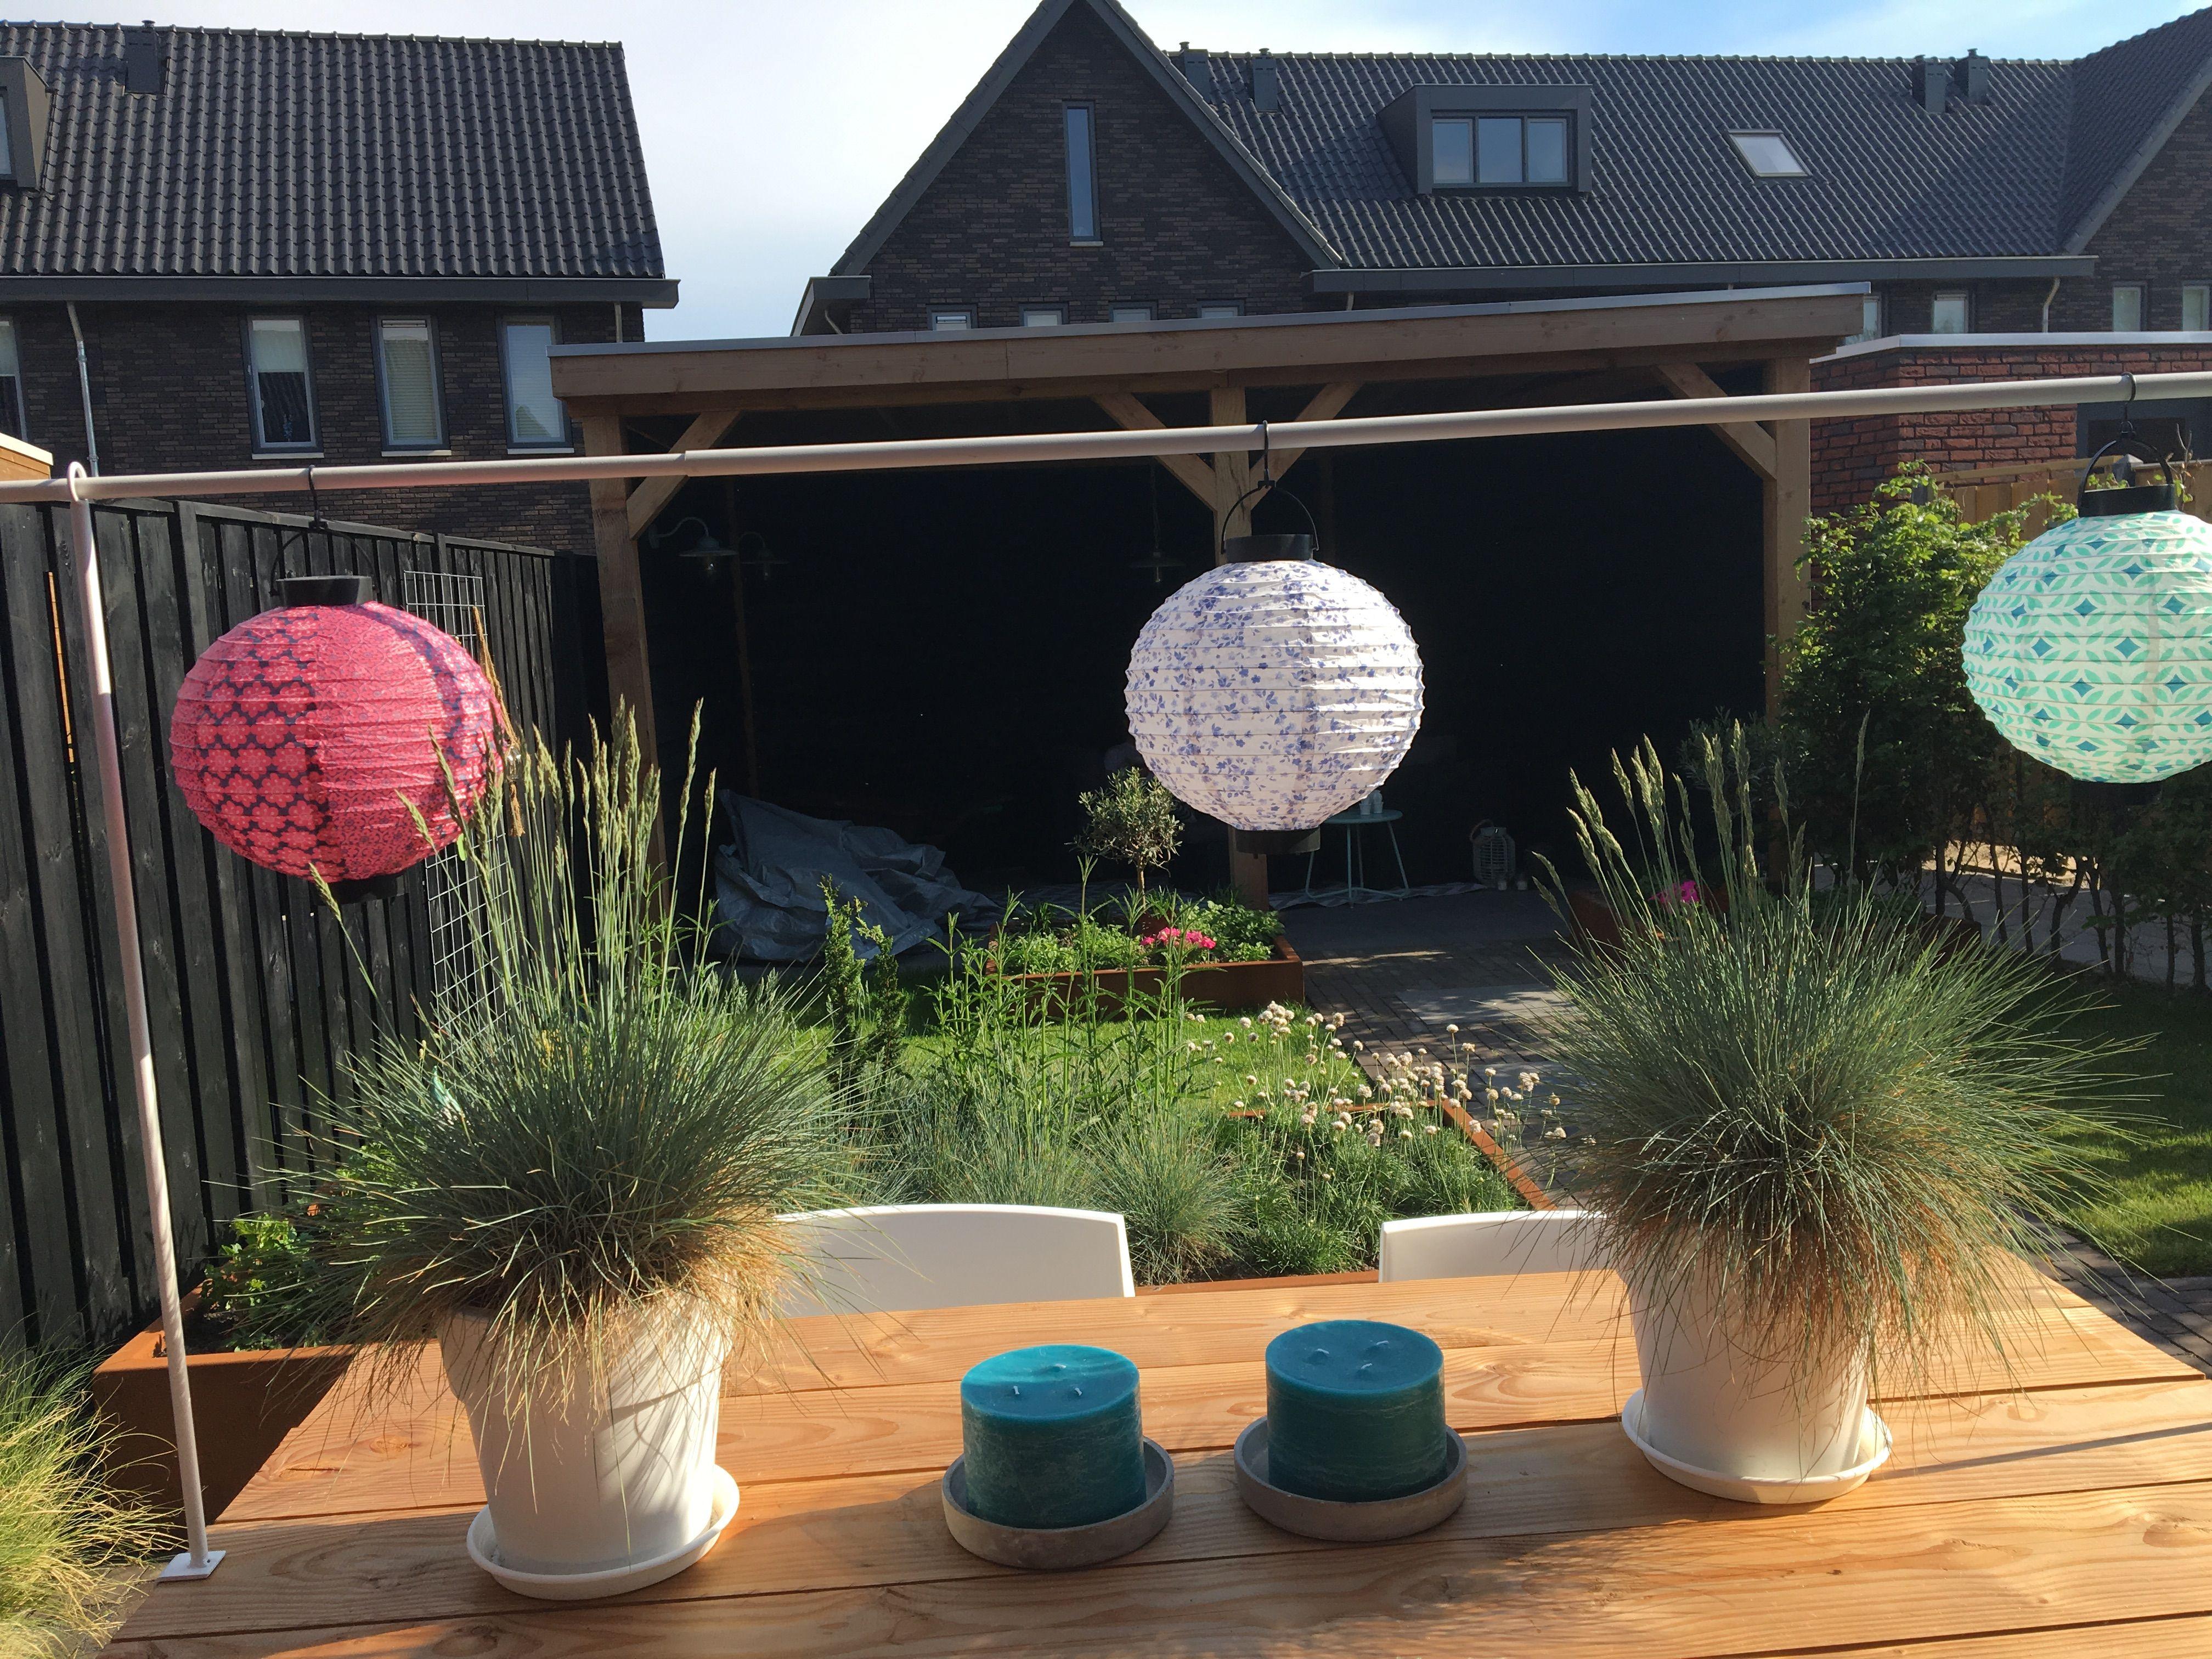 Spiegel Tuin Intratuin : Bamboestokken intratuin luxe huisideeën